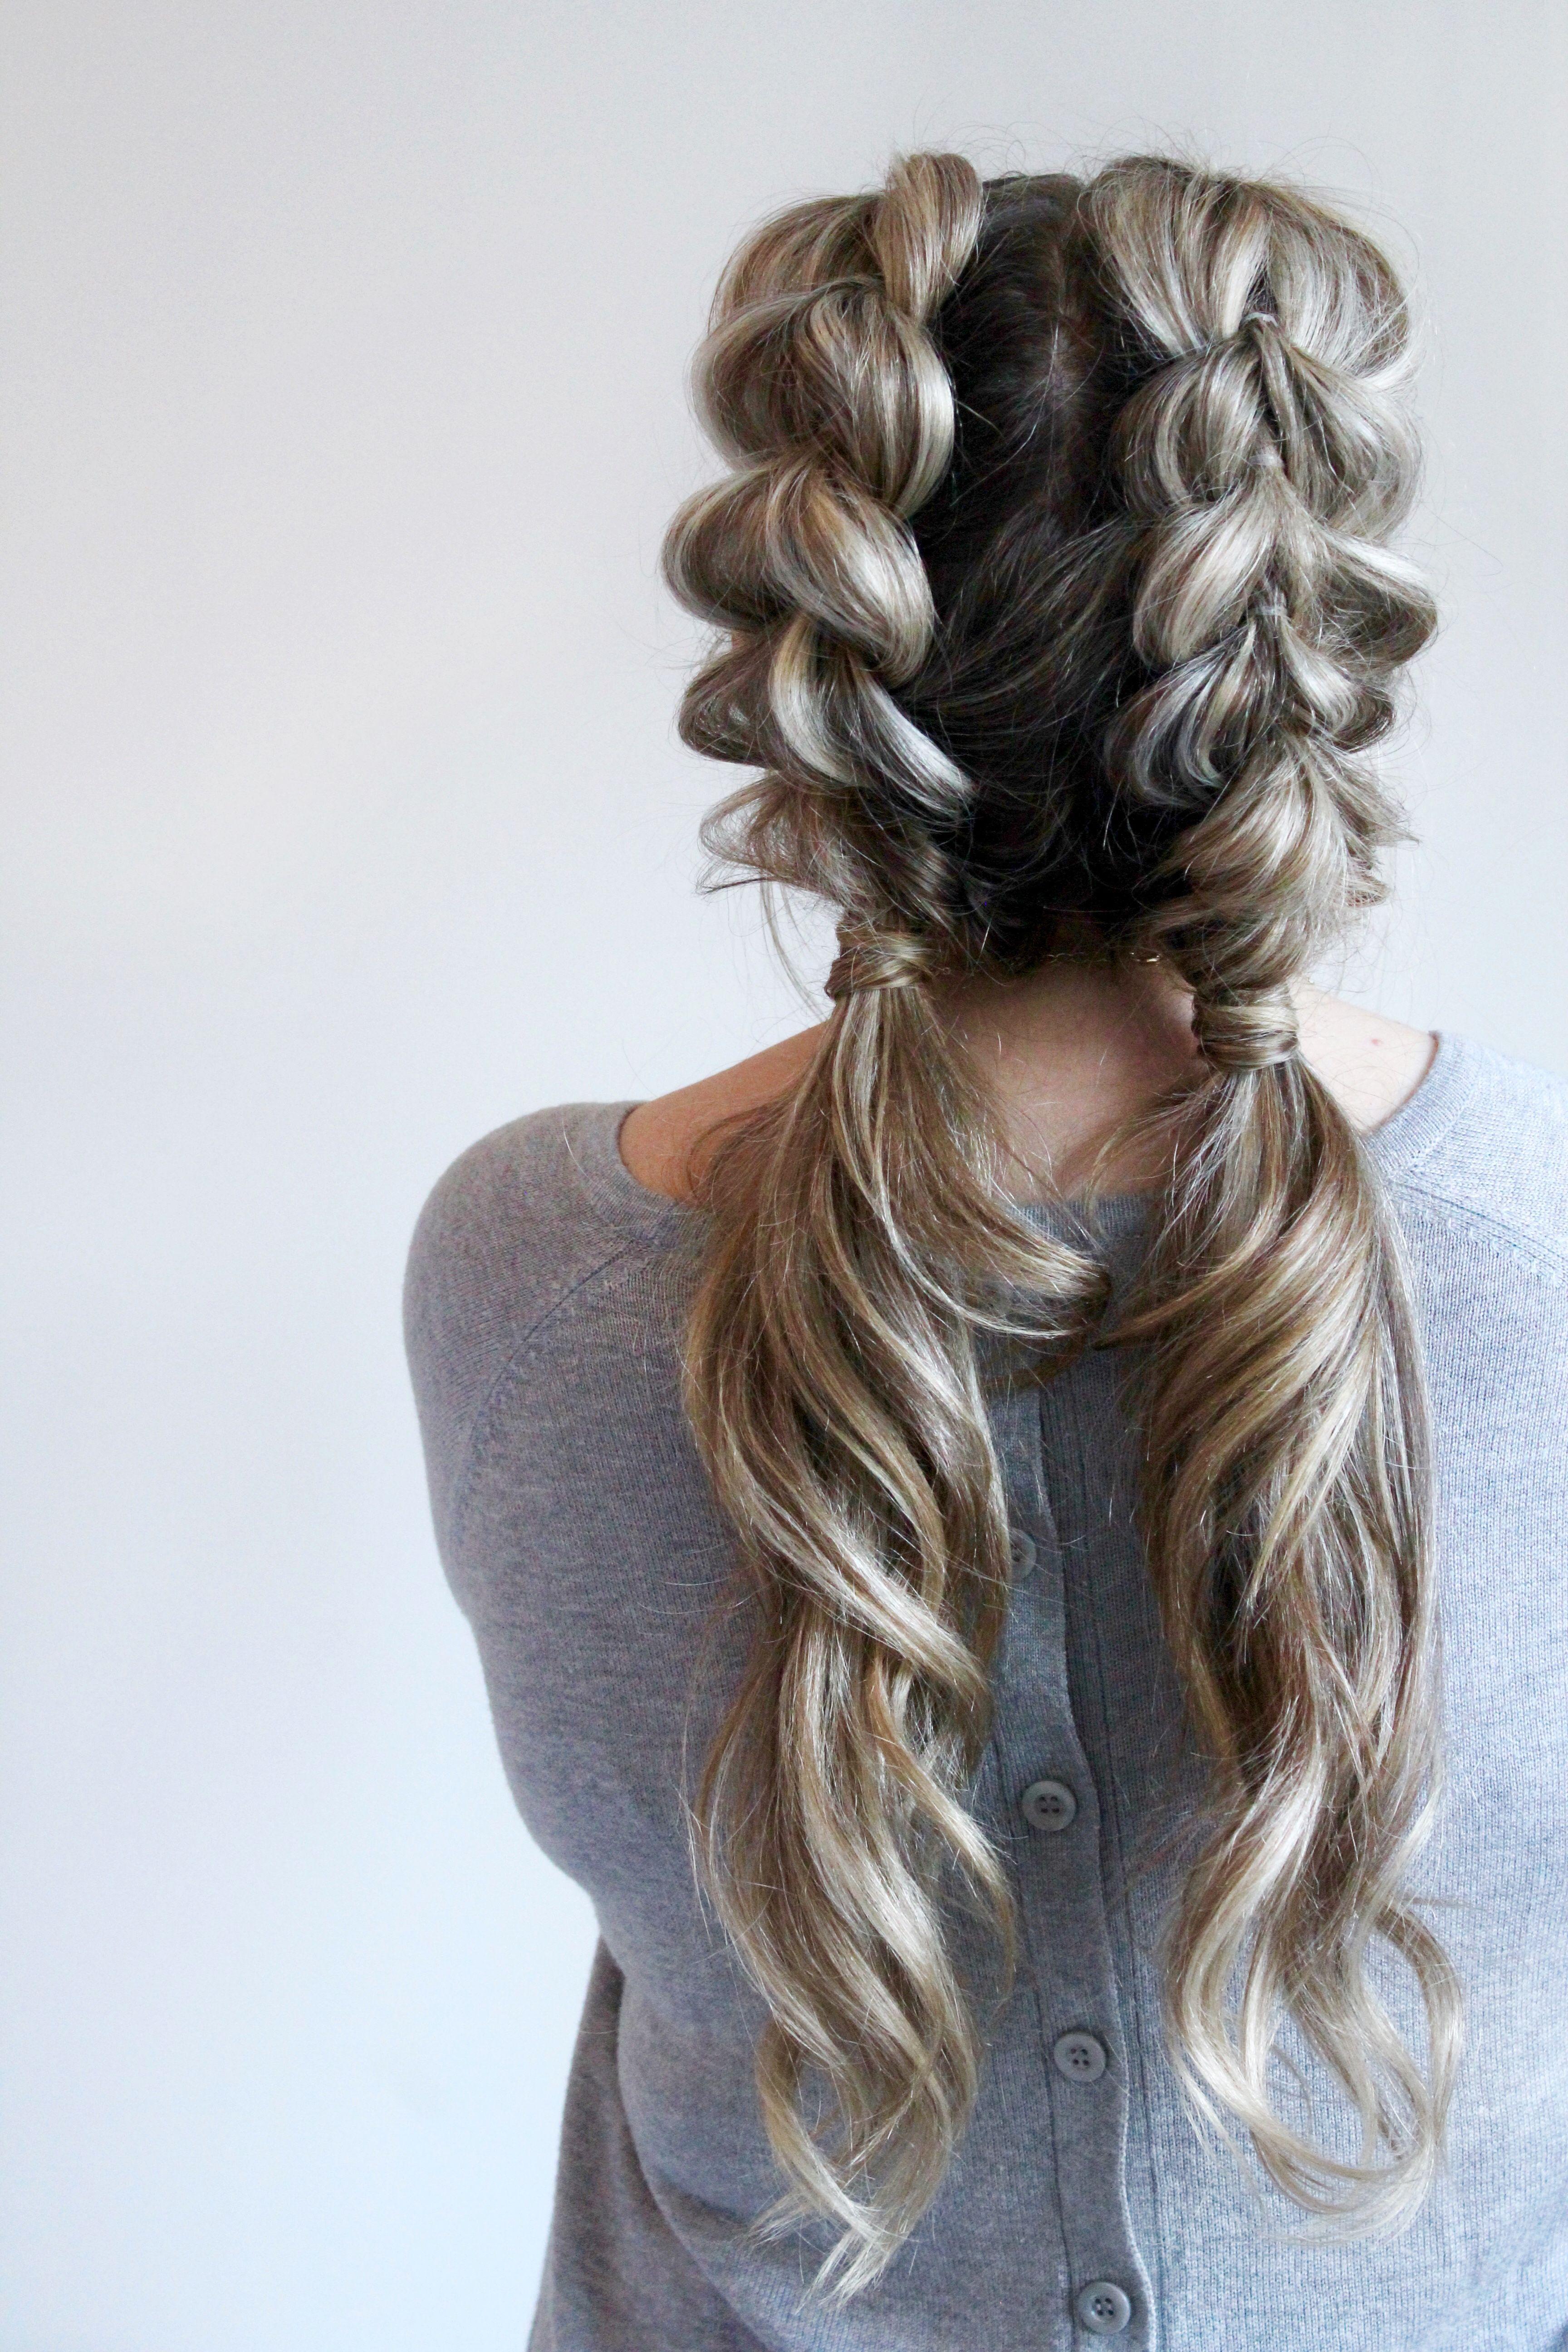 jumbo pull through braid pigtails tutorial | braids | long